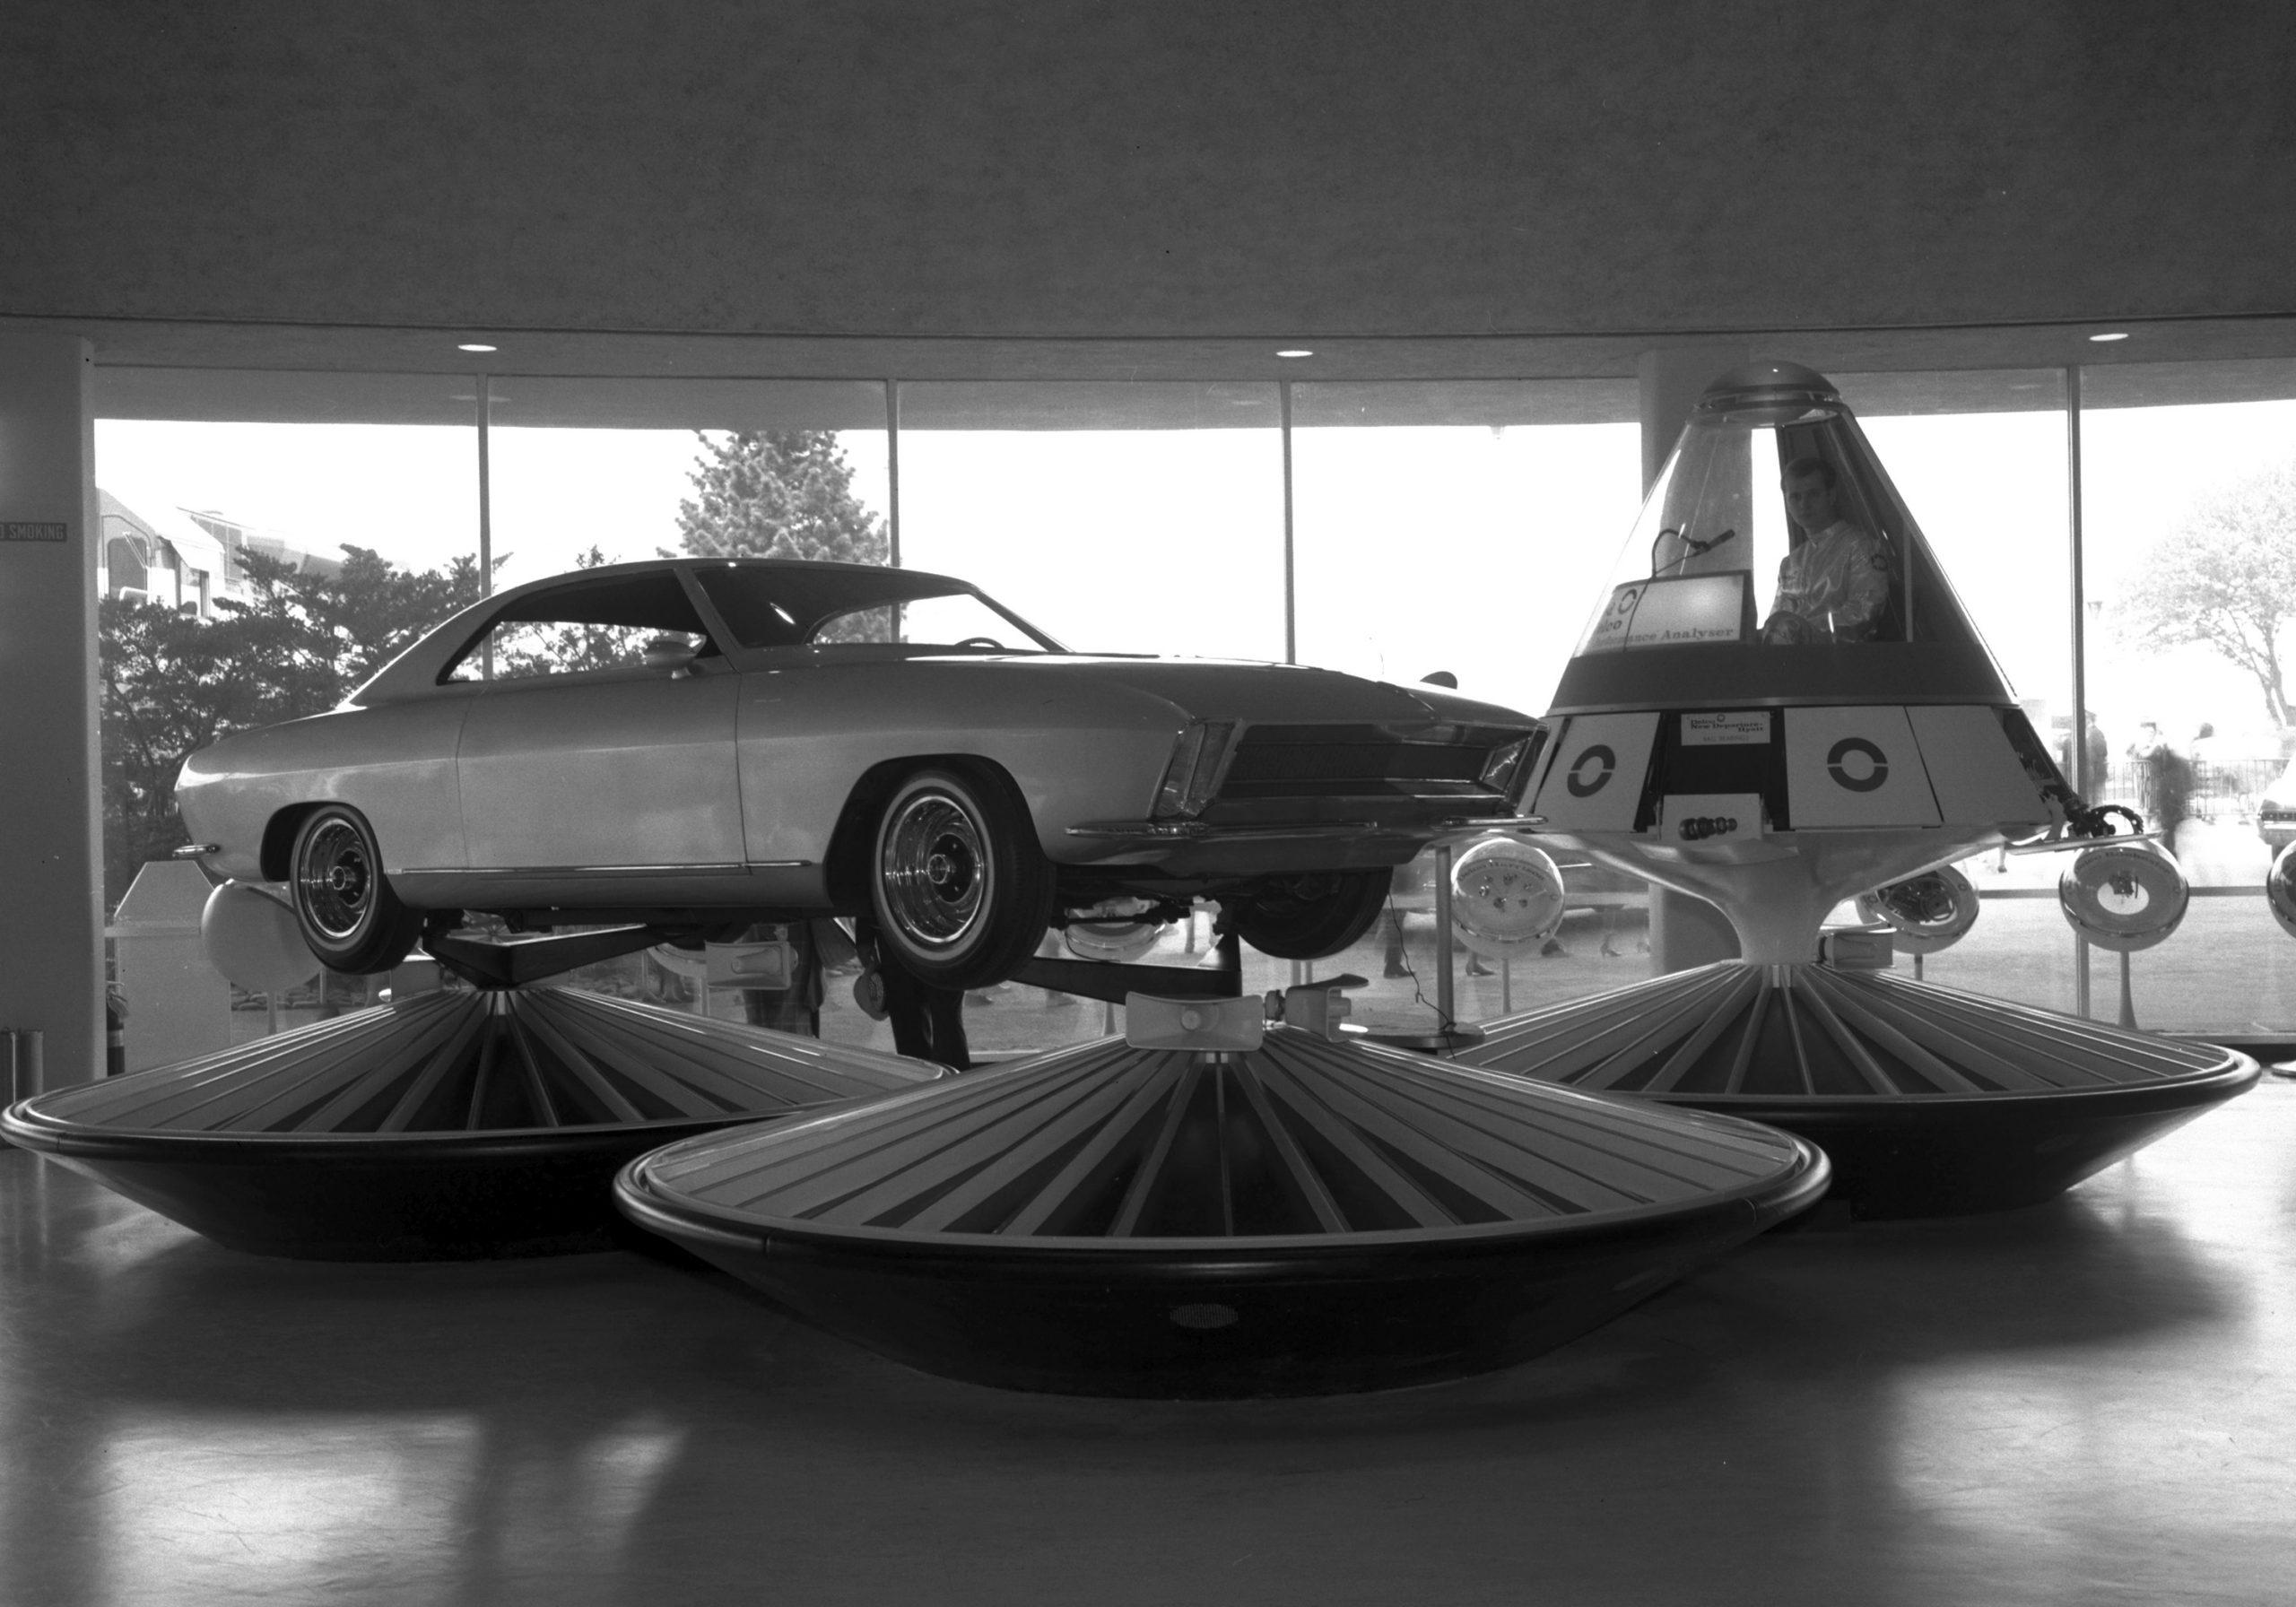 1964 Chevrolet Super Nova concept 7 space capsule